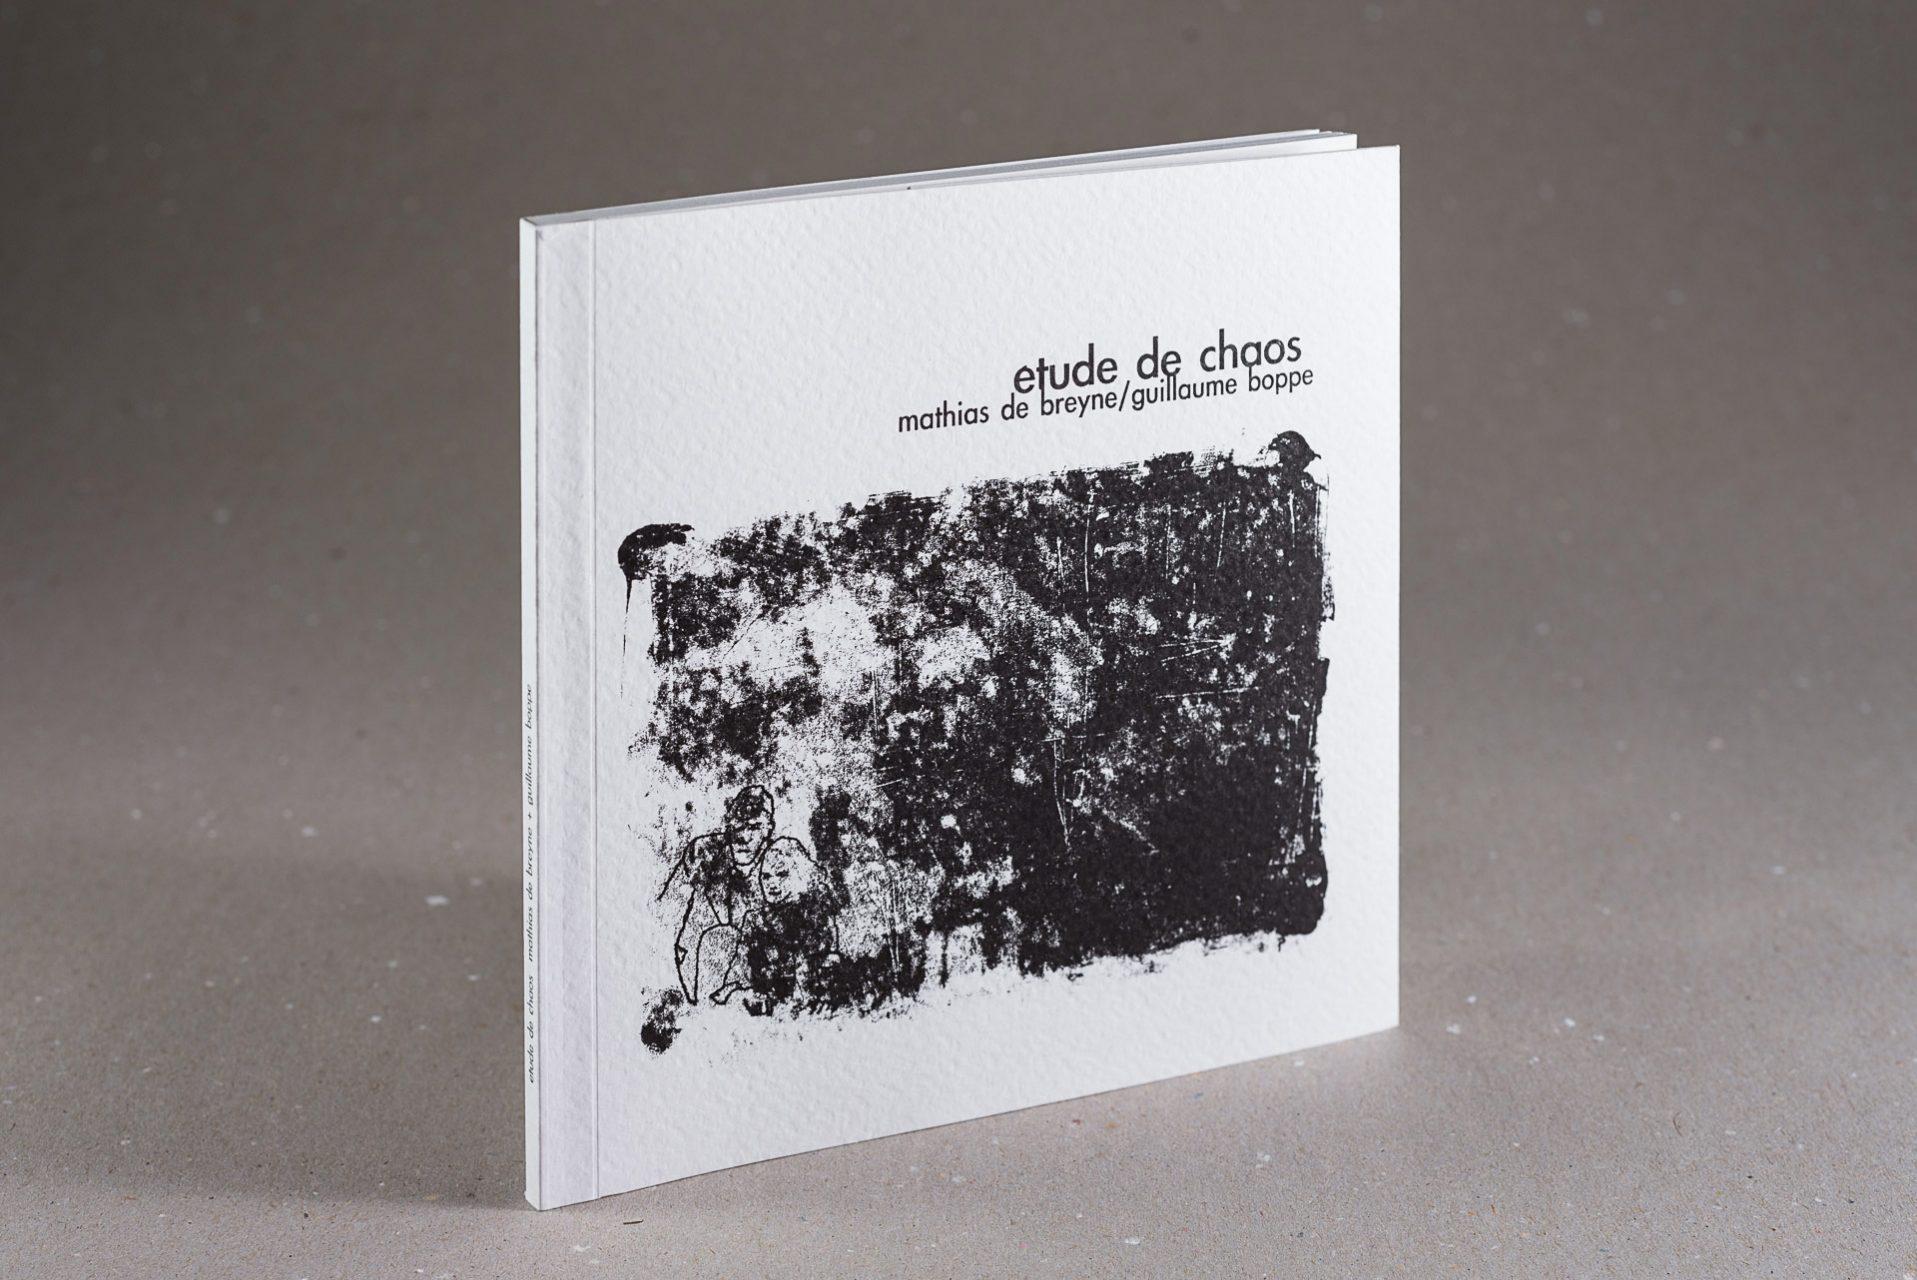 web-hd-nuit-myrtide-livre-etude-de-chaos-de-breyne-boppe-01